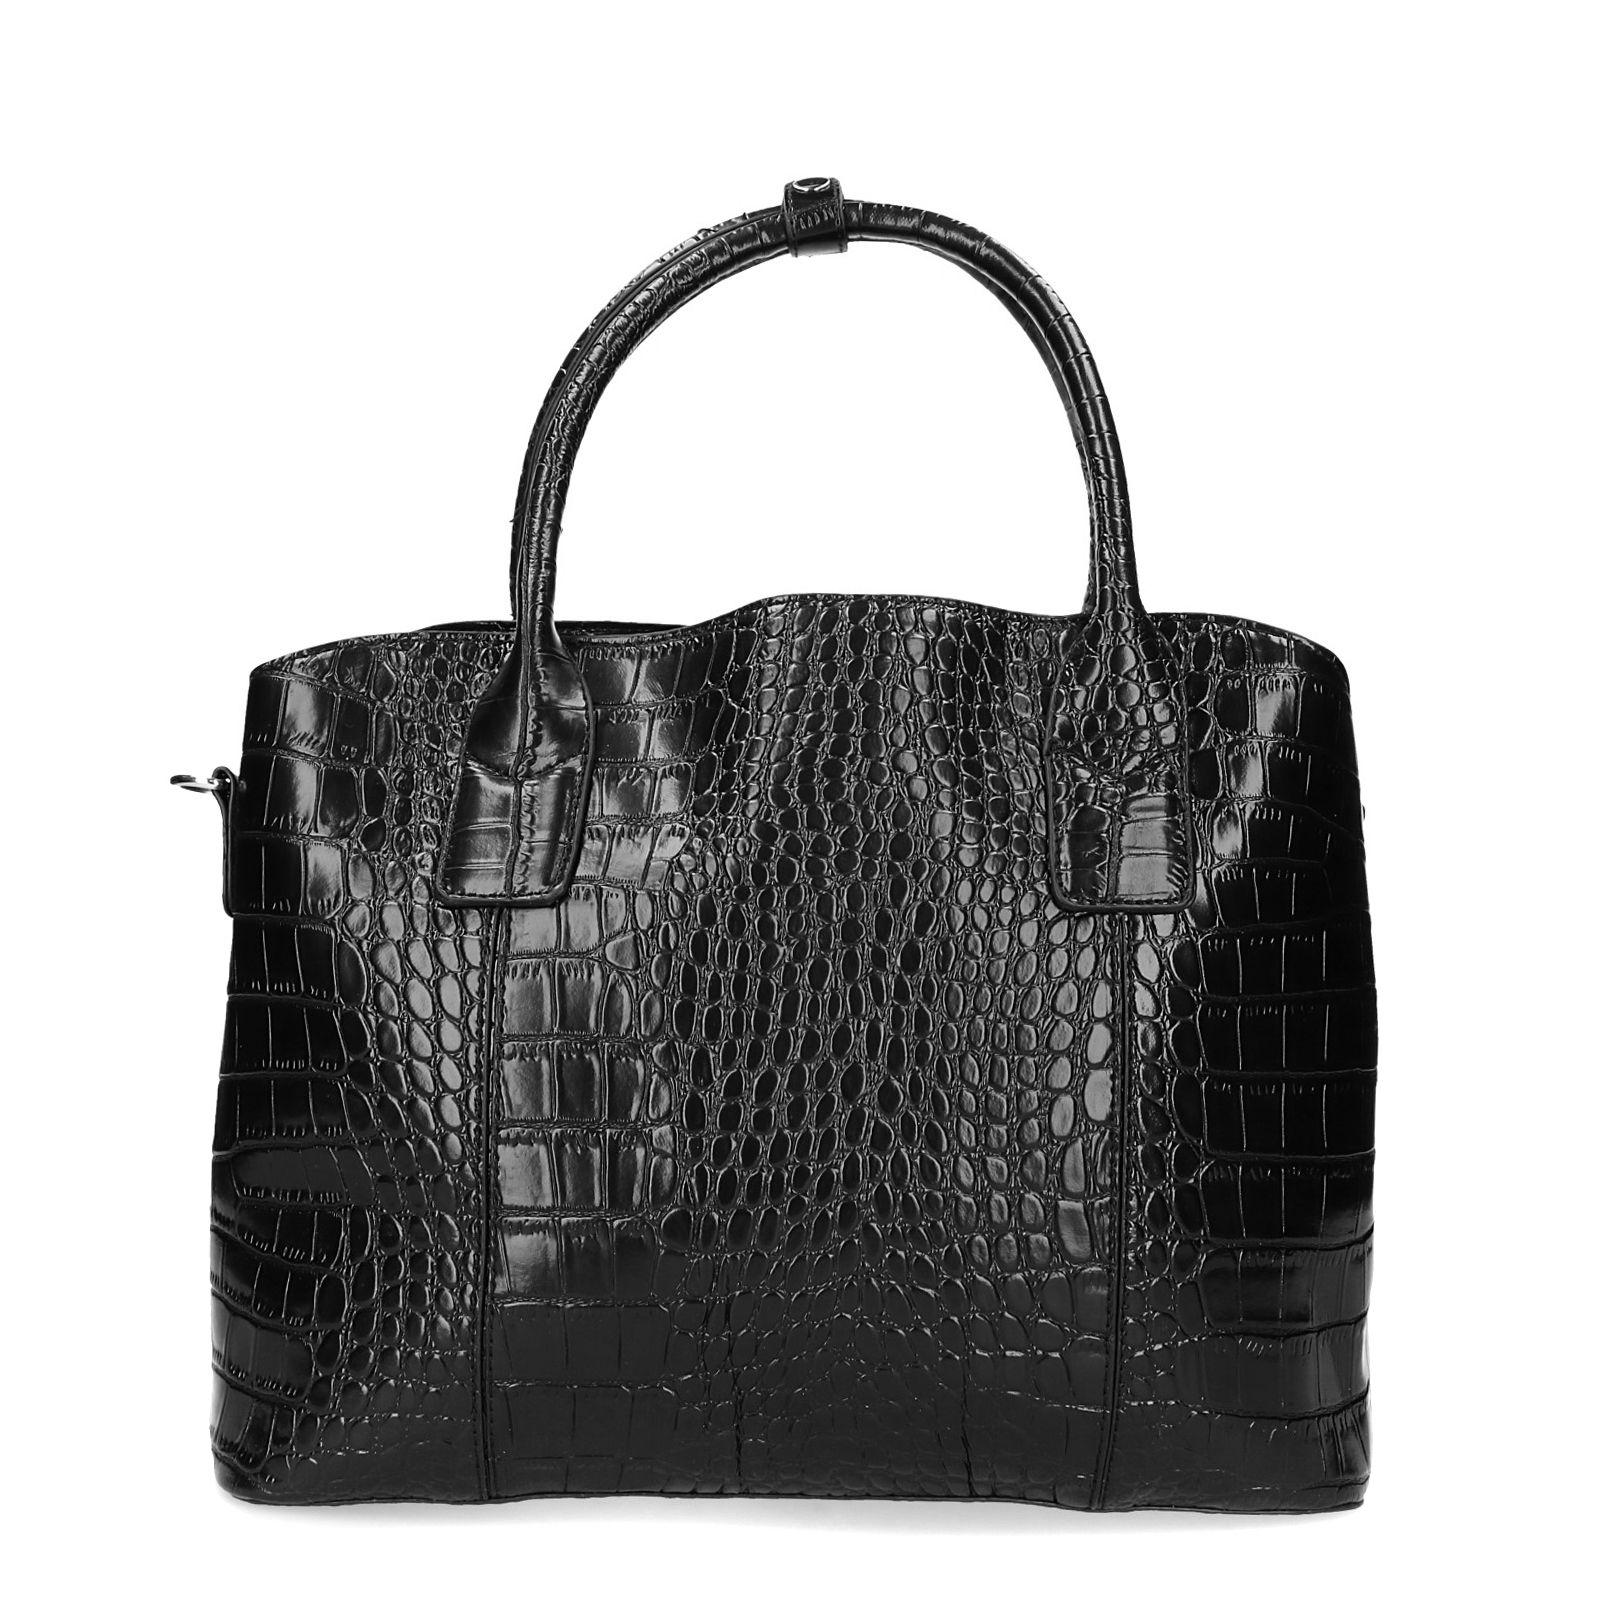 b592e32288f Lak zwarte snakeskin handtas - Tassen – SACHA